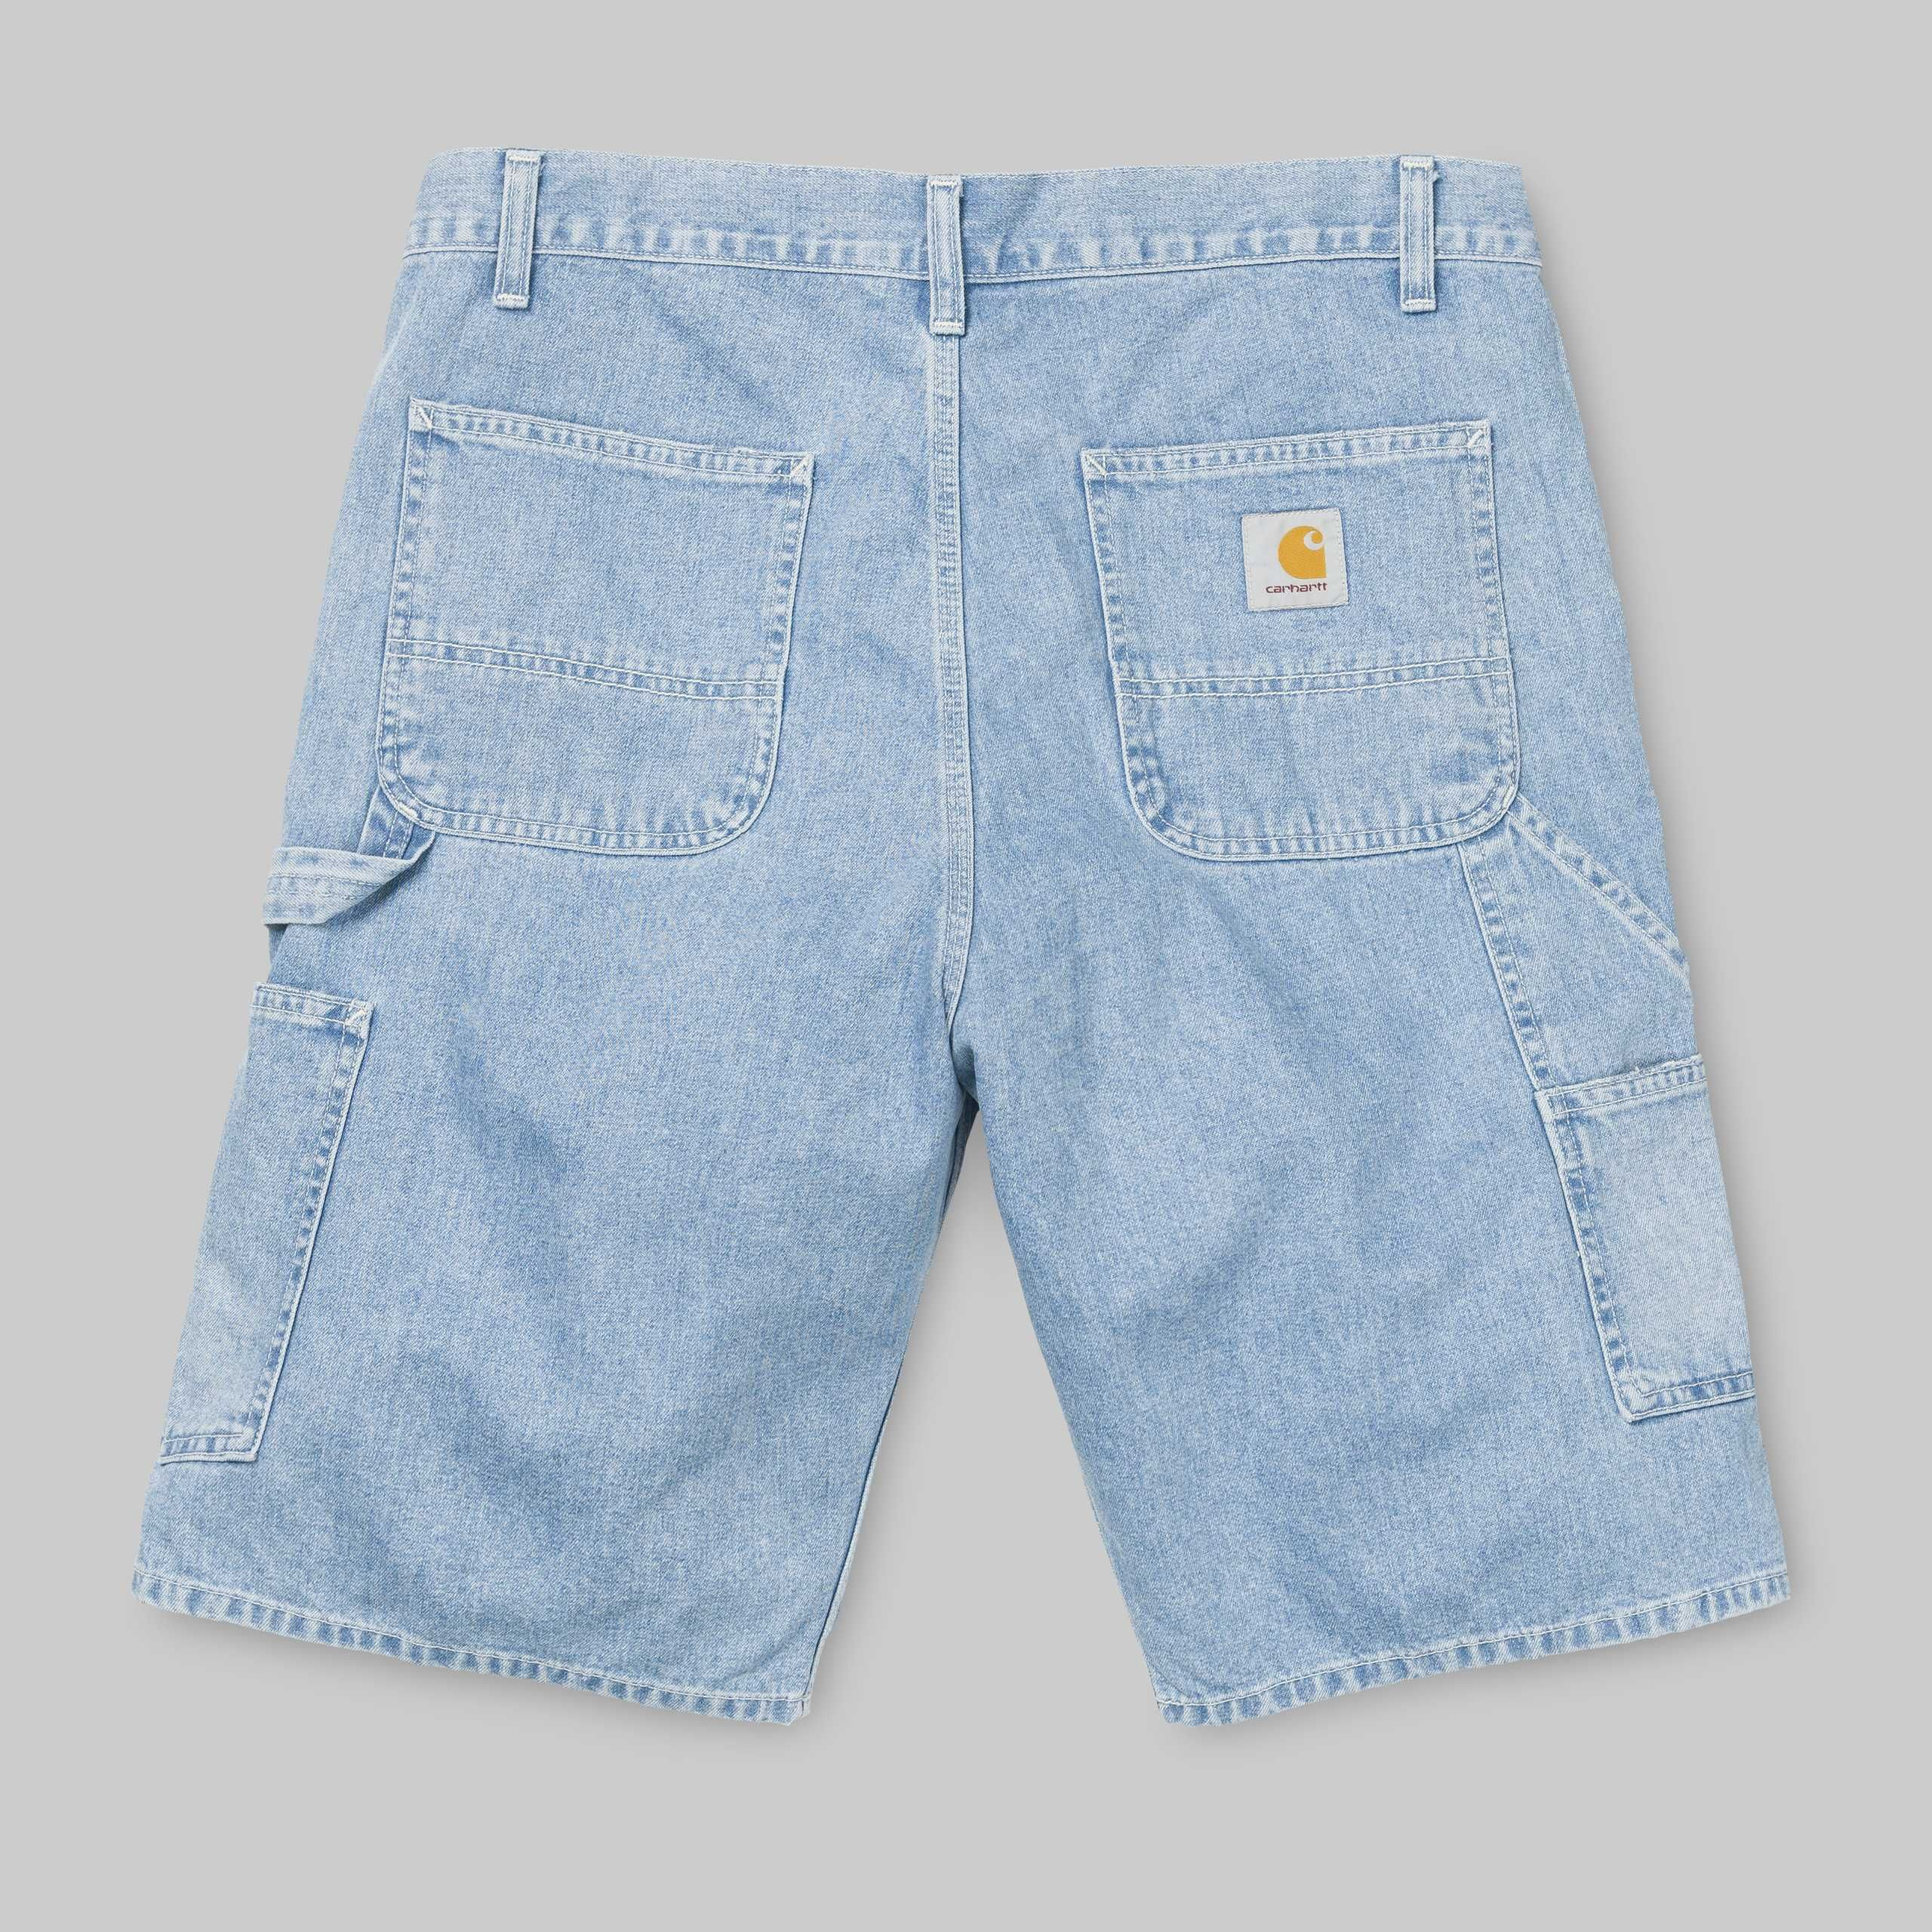 Bermuda Carhartt Jeans Ruck Knee